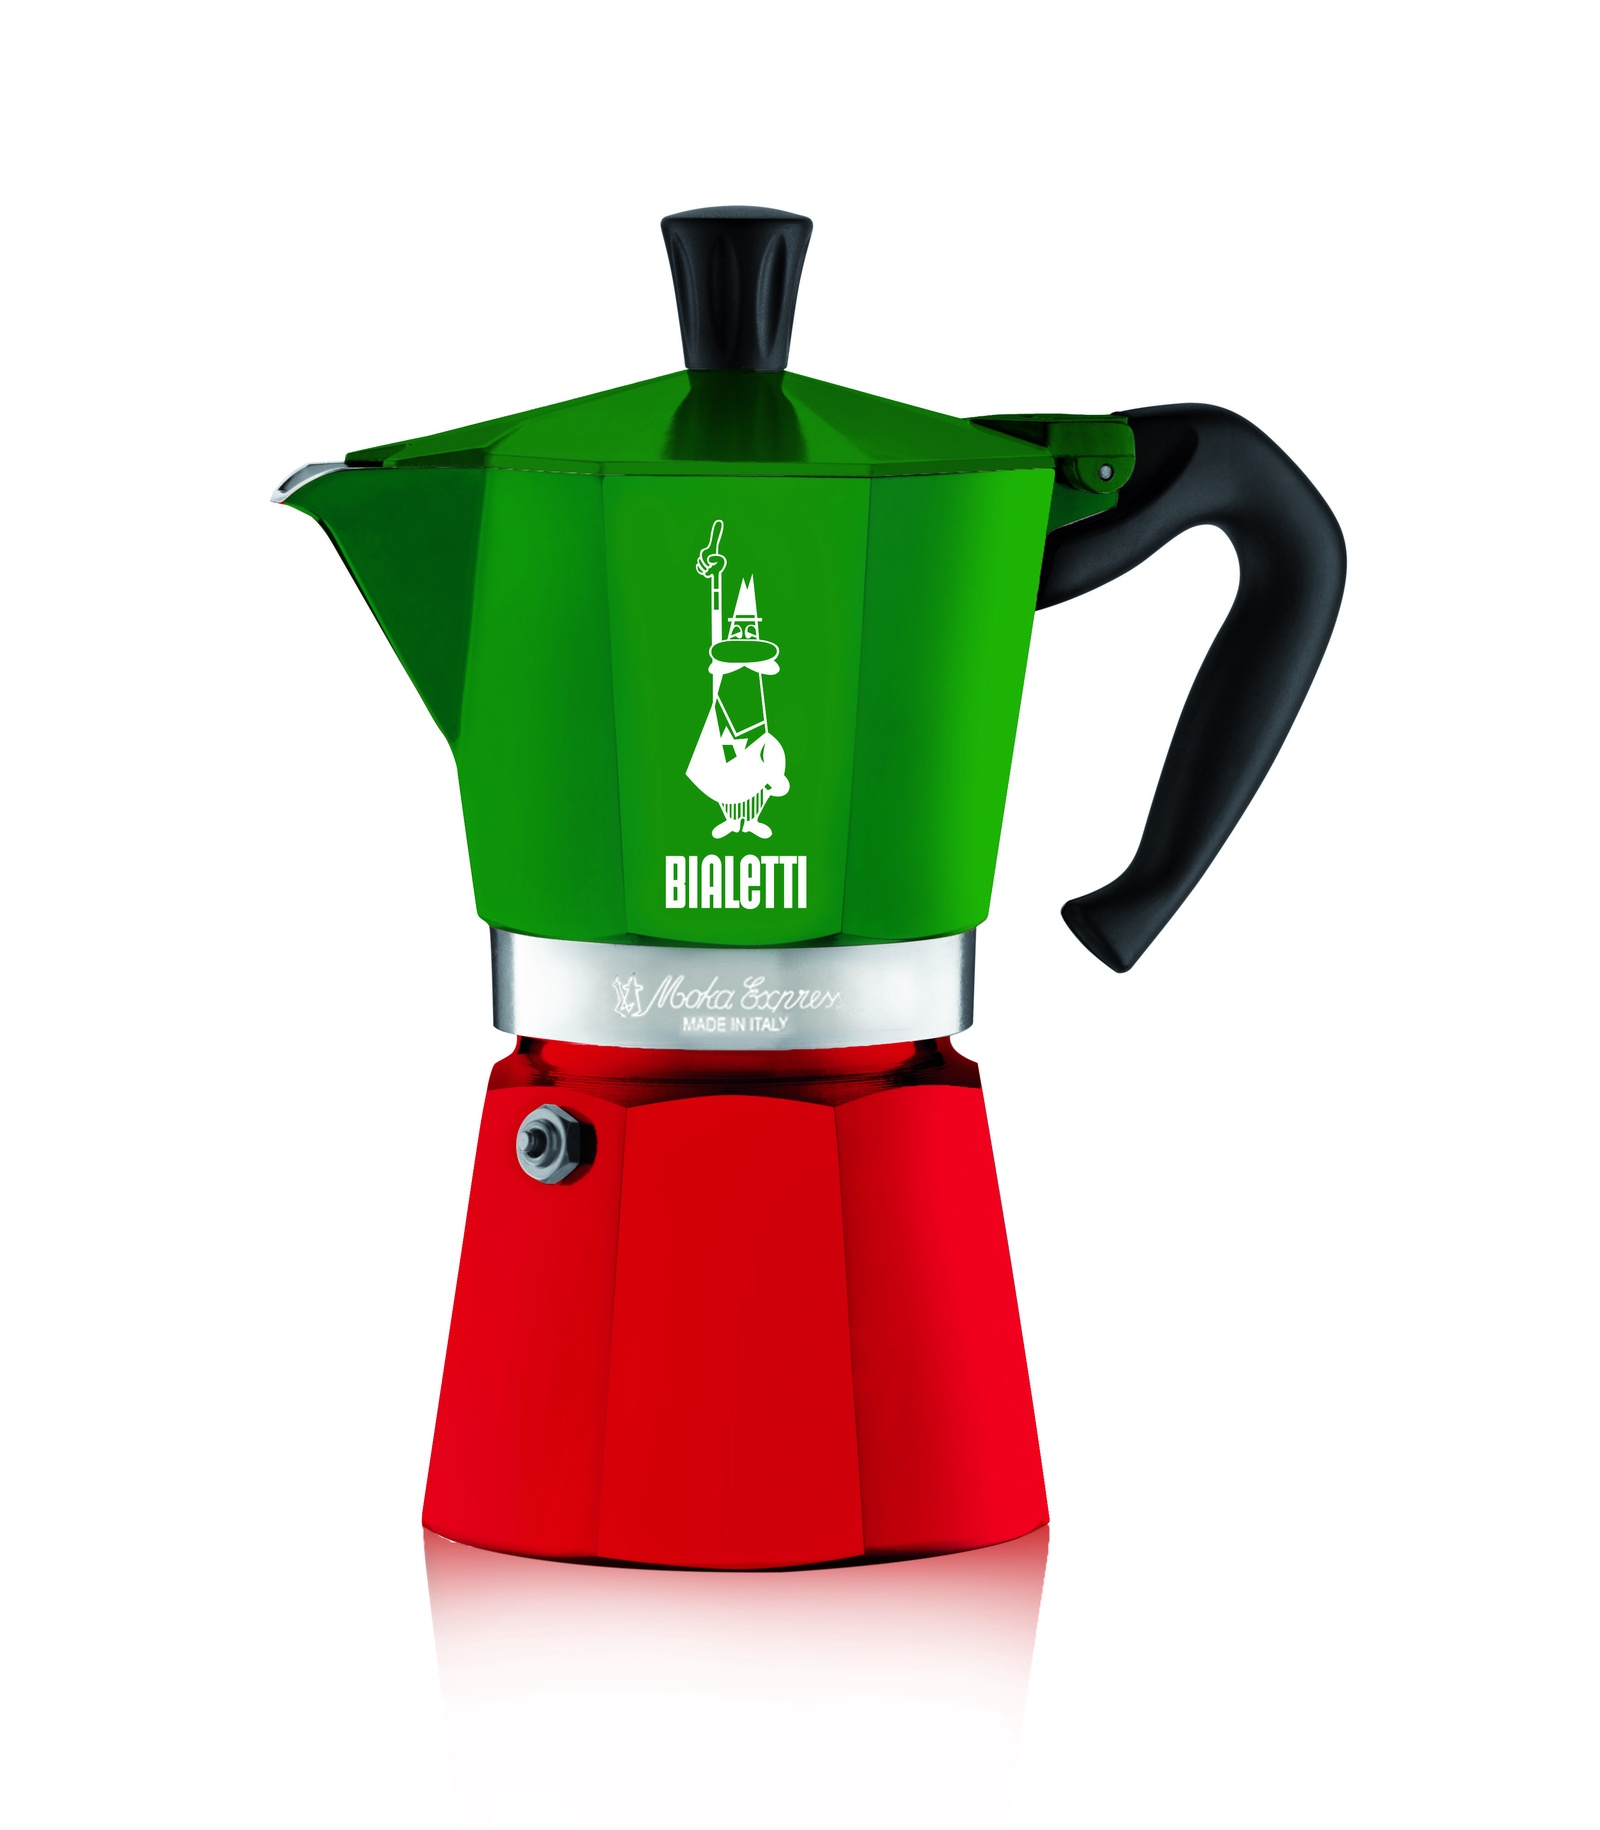 Гейзерная кофеварка Bialetti Moka Express Италия, на 6 чашек, Алюминий кофеварка гейзерная bialetti moka induzione 3 порции сталь 4922